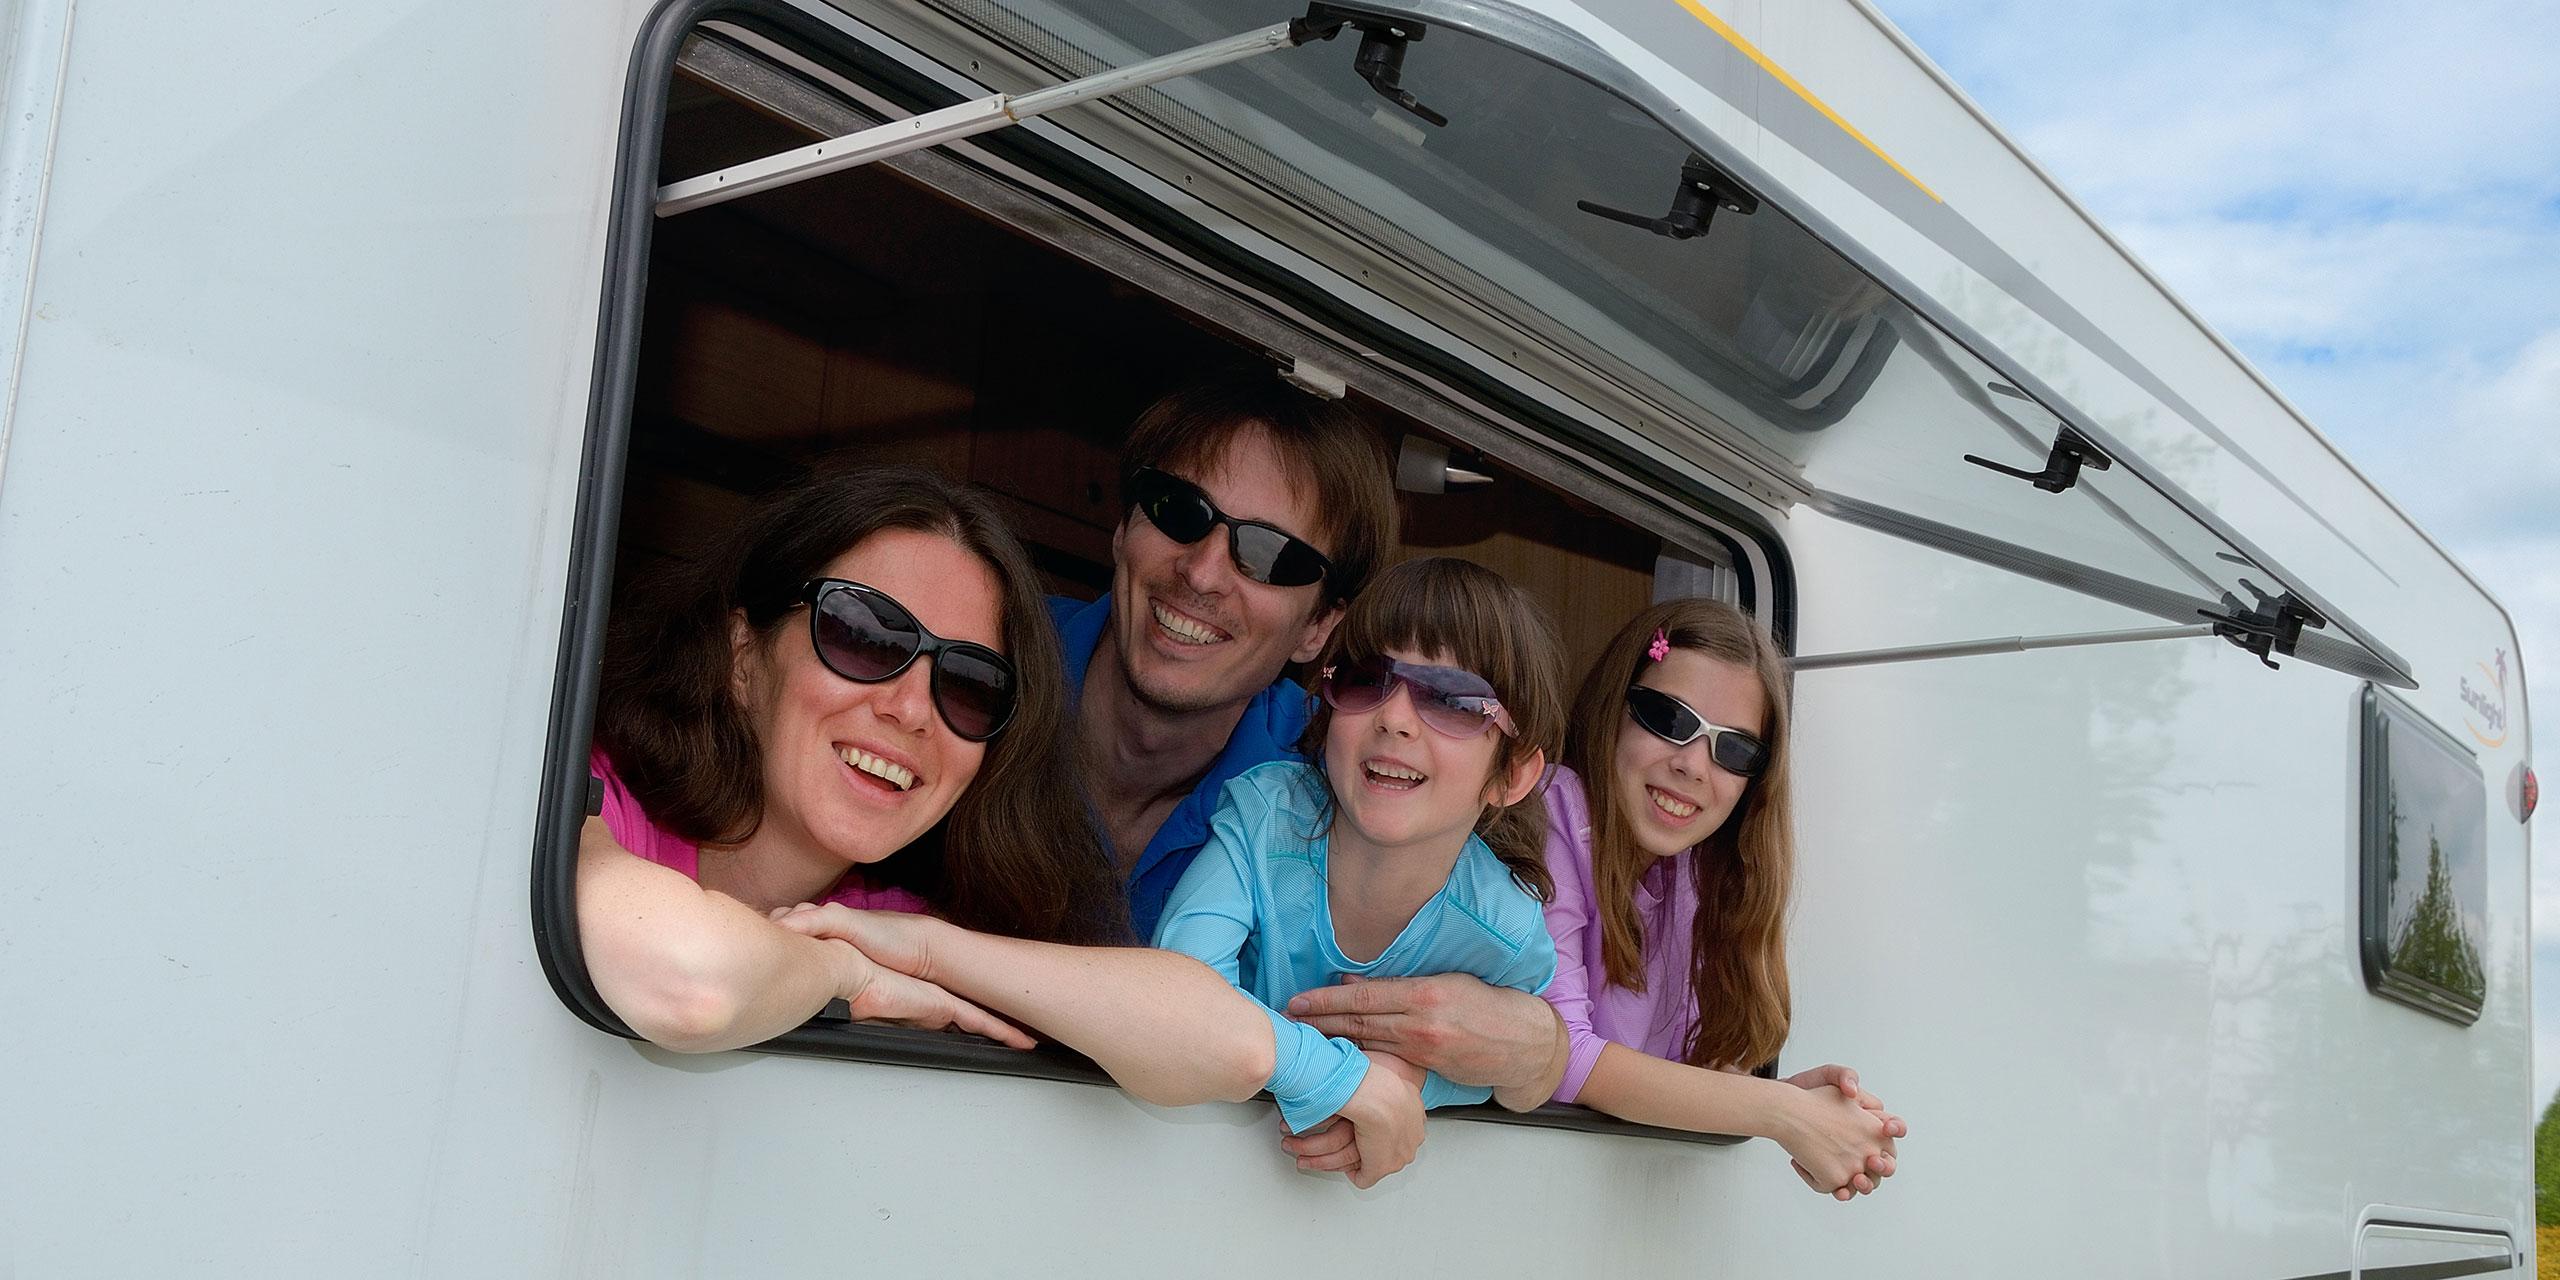 RV Family Vacations; Courtesy of JaySi/Shutterstock.com